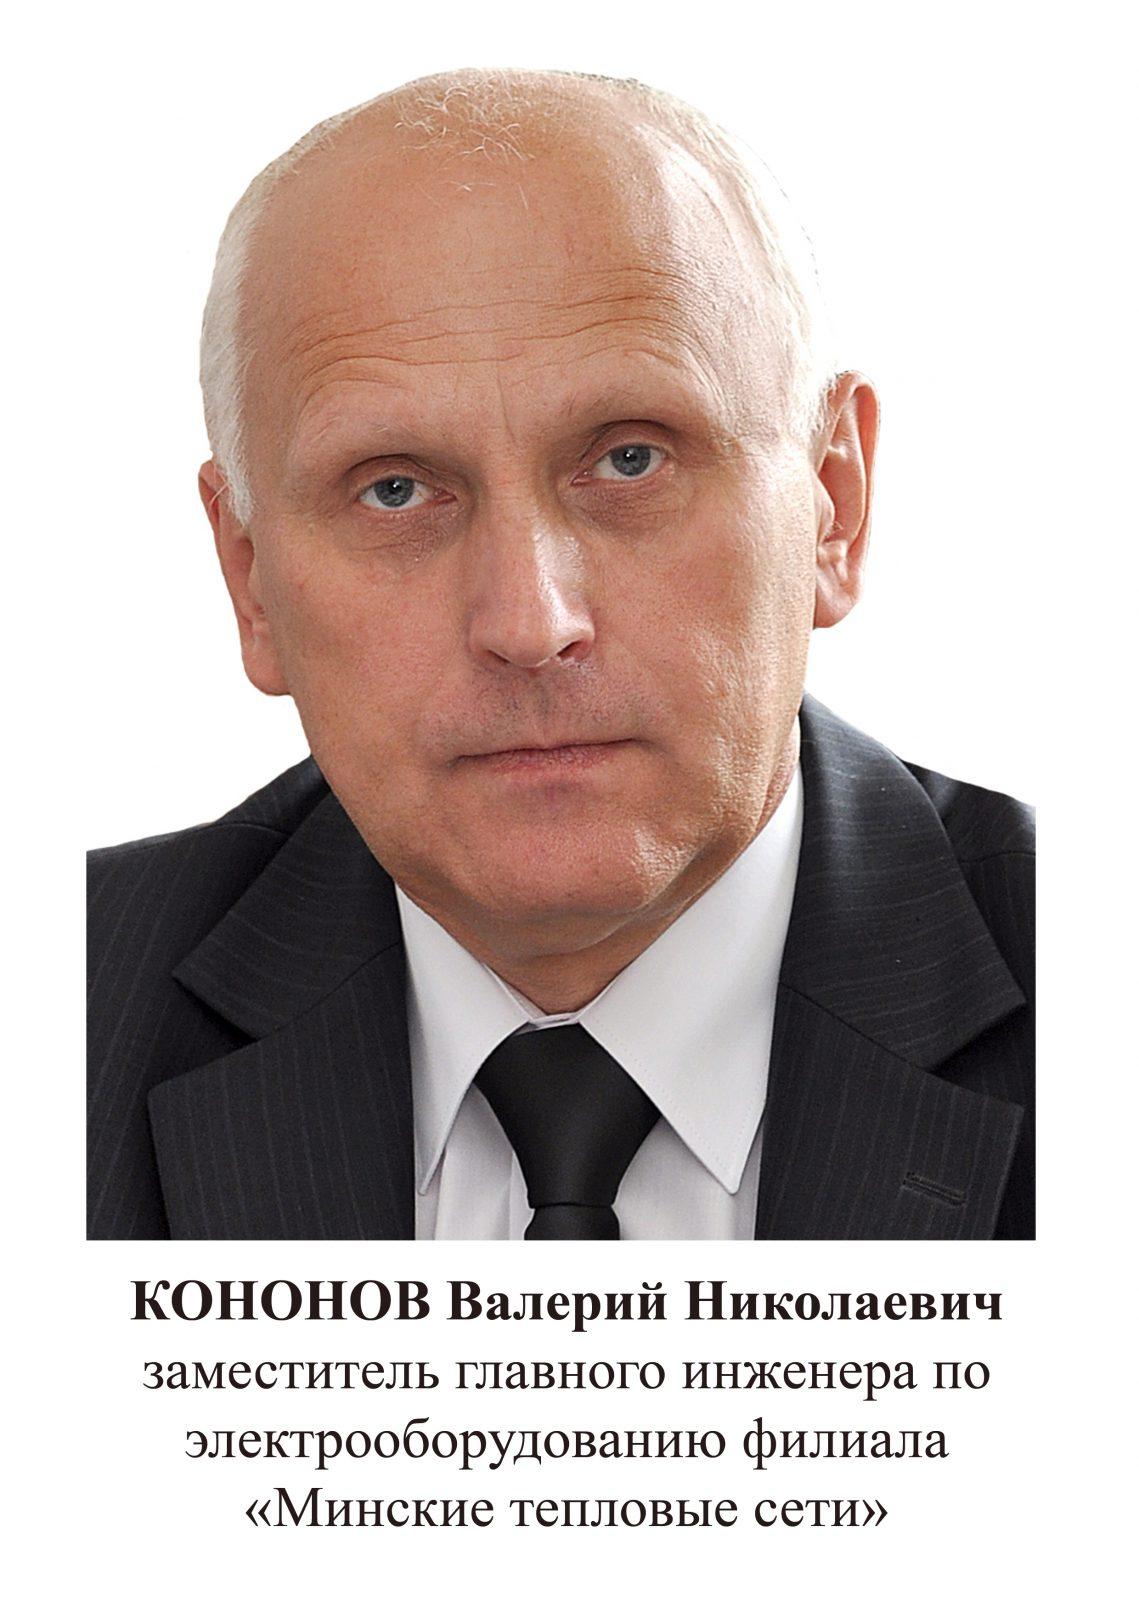 Кононов Валерий Николаевич